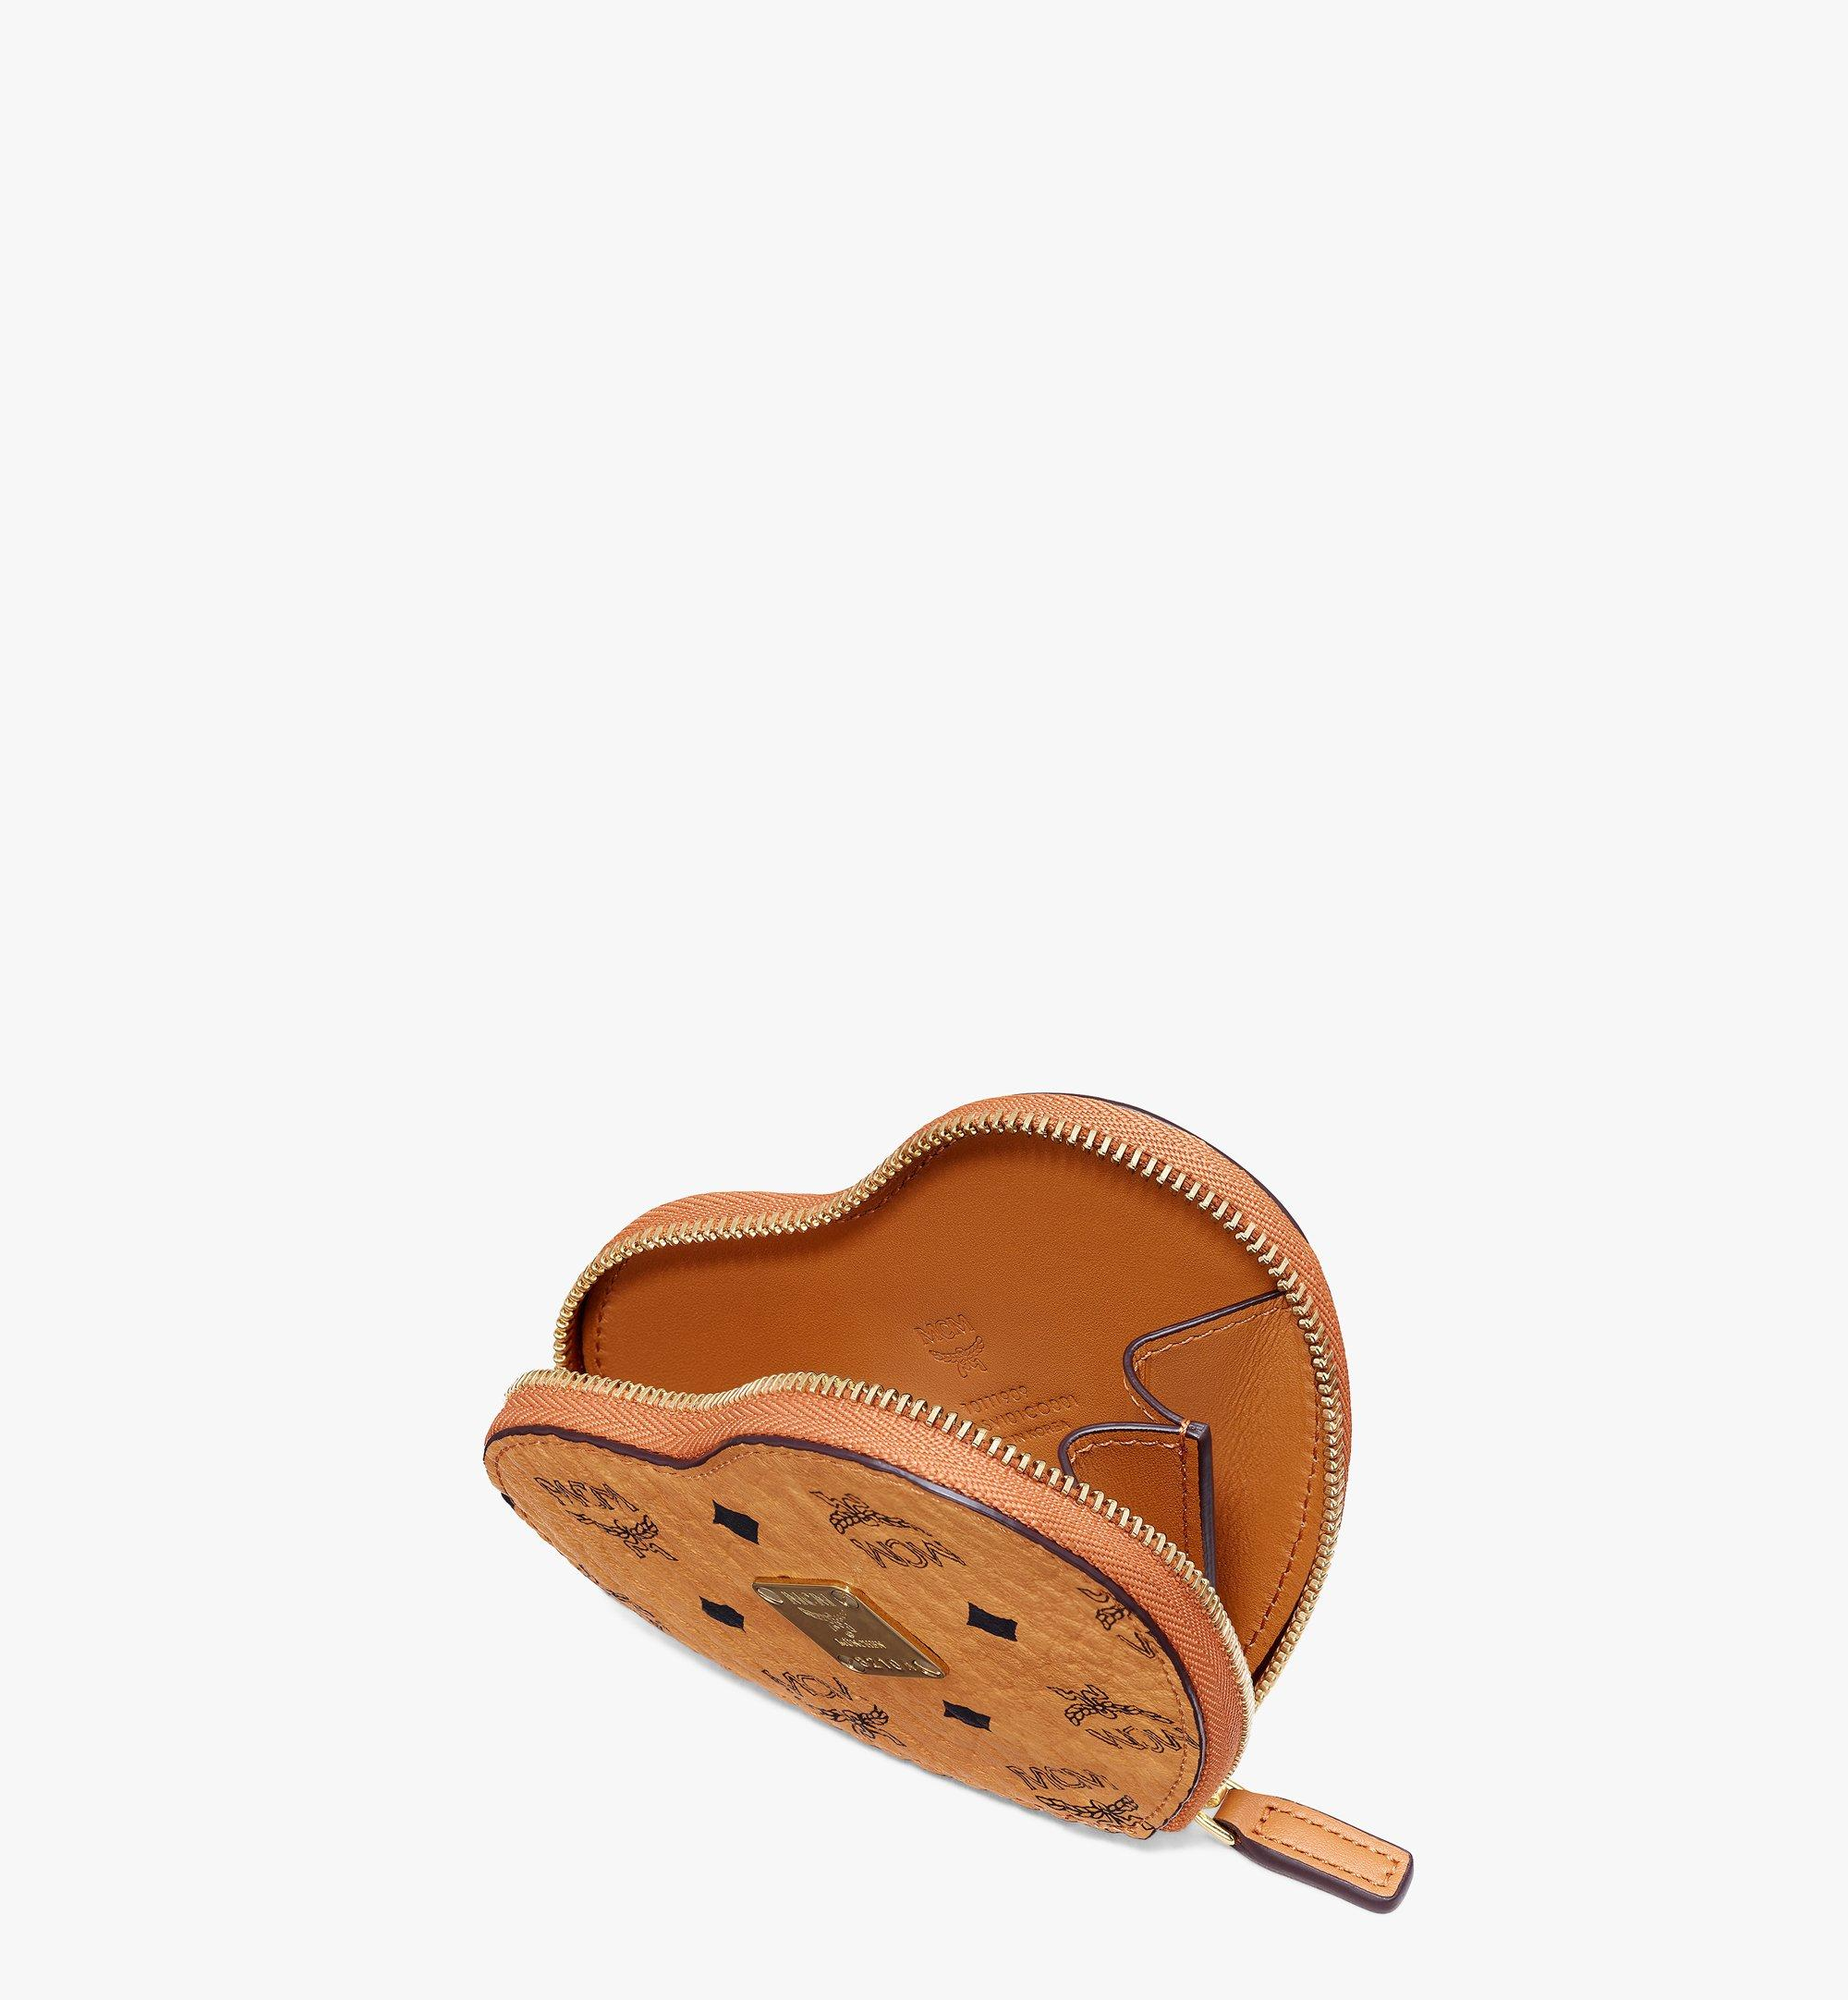 MCM Herzförmiger Münzbeutel in Visetos Original Cognac MYIAAVI02CO001 Noch mehr sehen 2